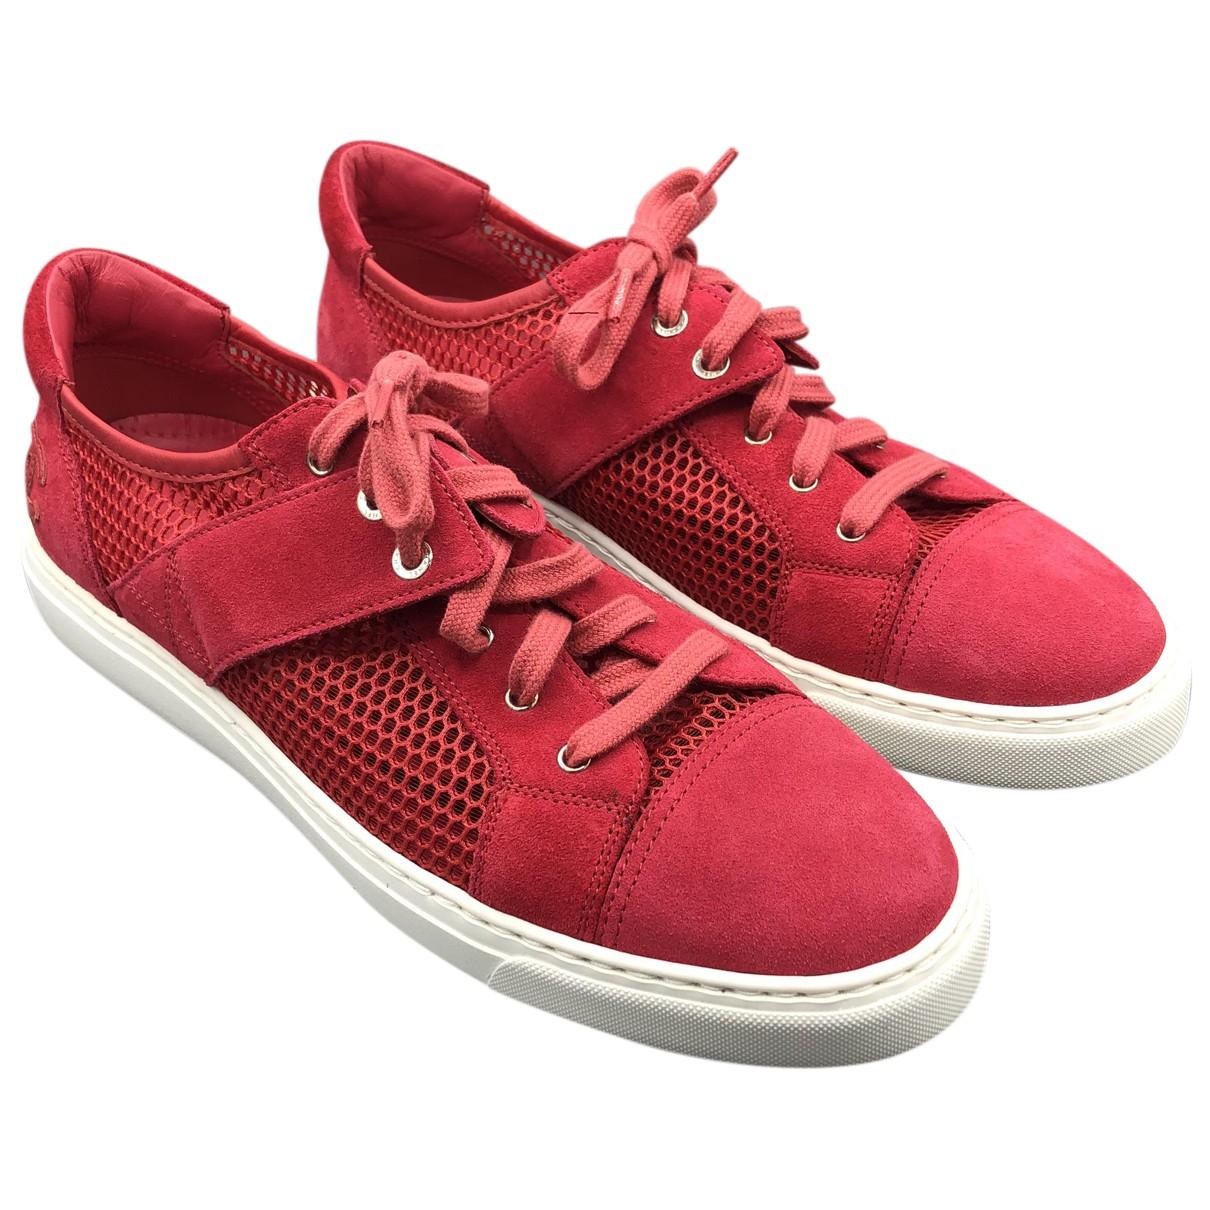 Chanel \N Sneakers in  Rosa Veloursleder